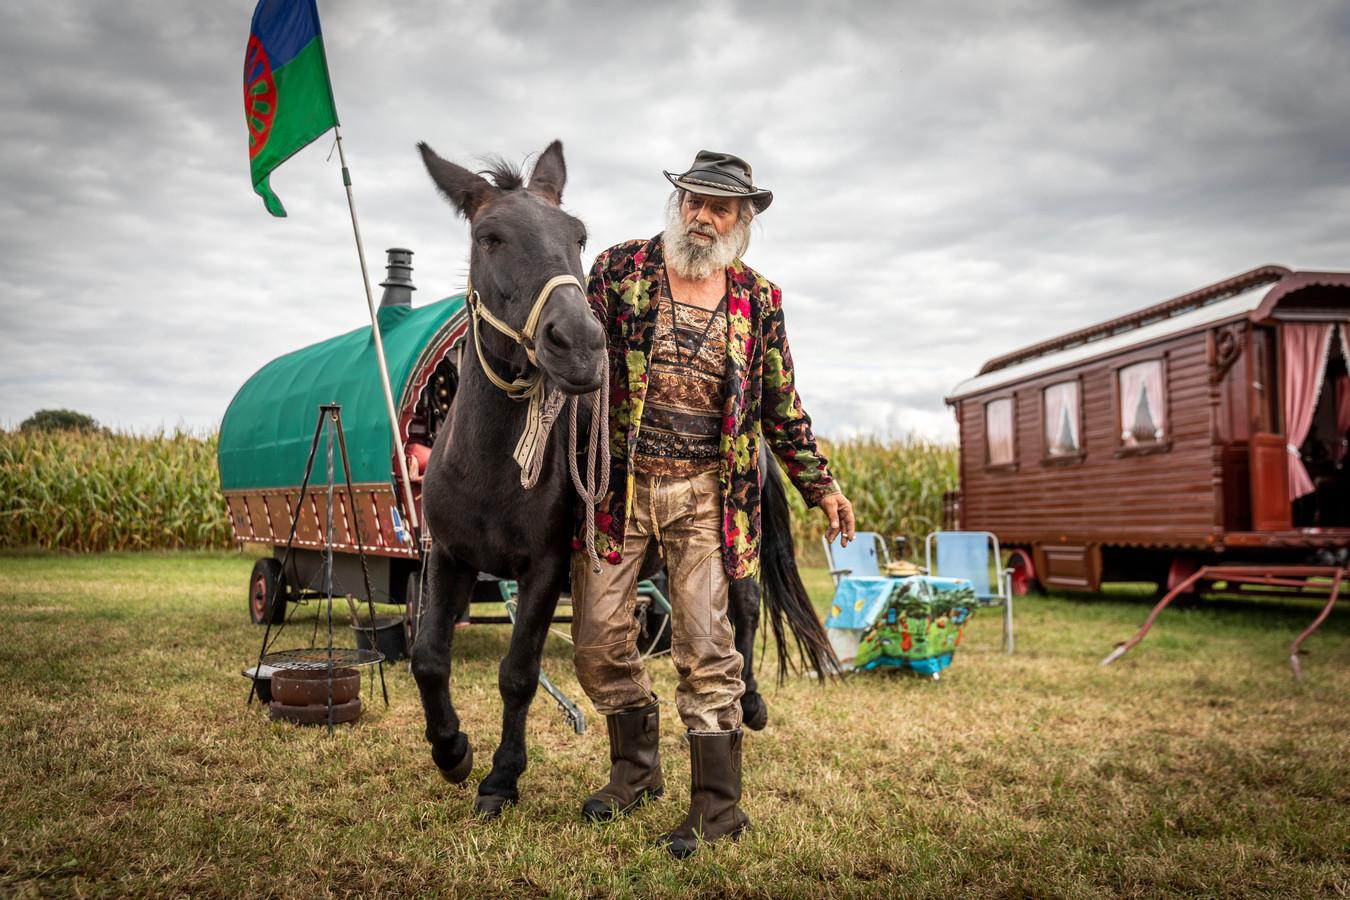 Foto ter illustratie van het festival Latcho Diewes in Sint Oedenrode.